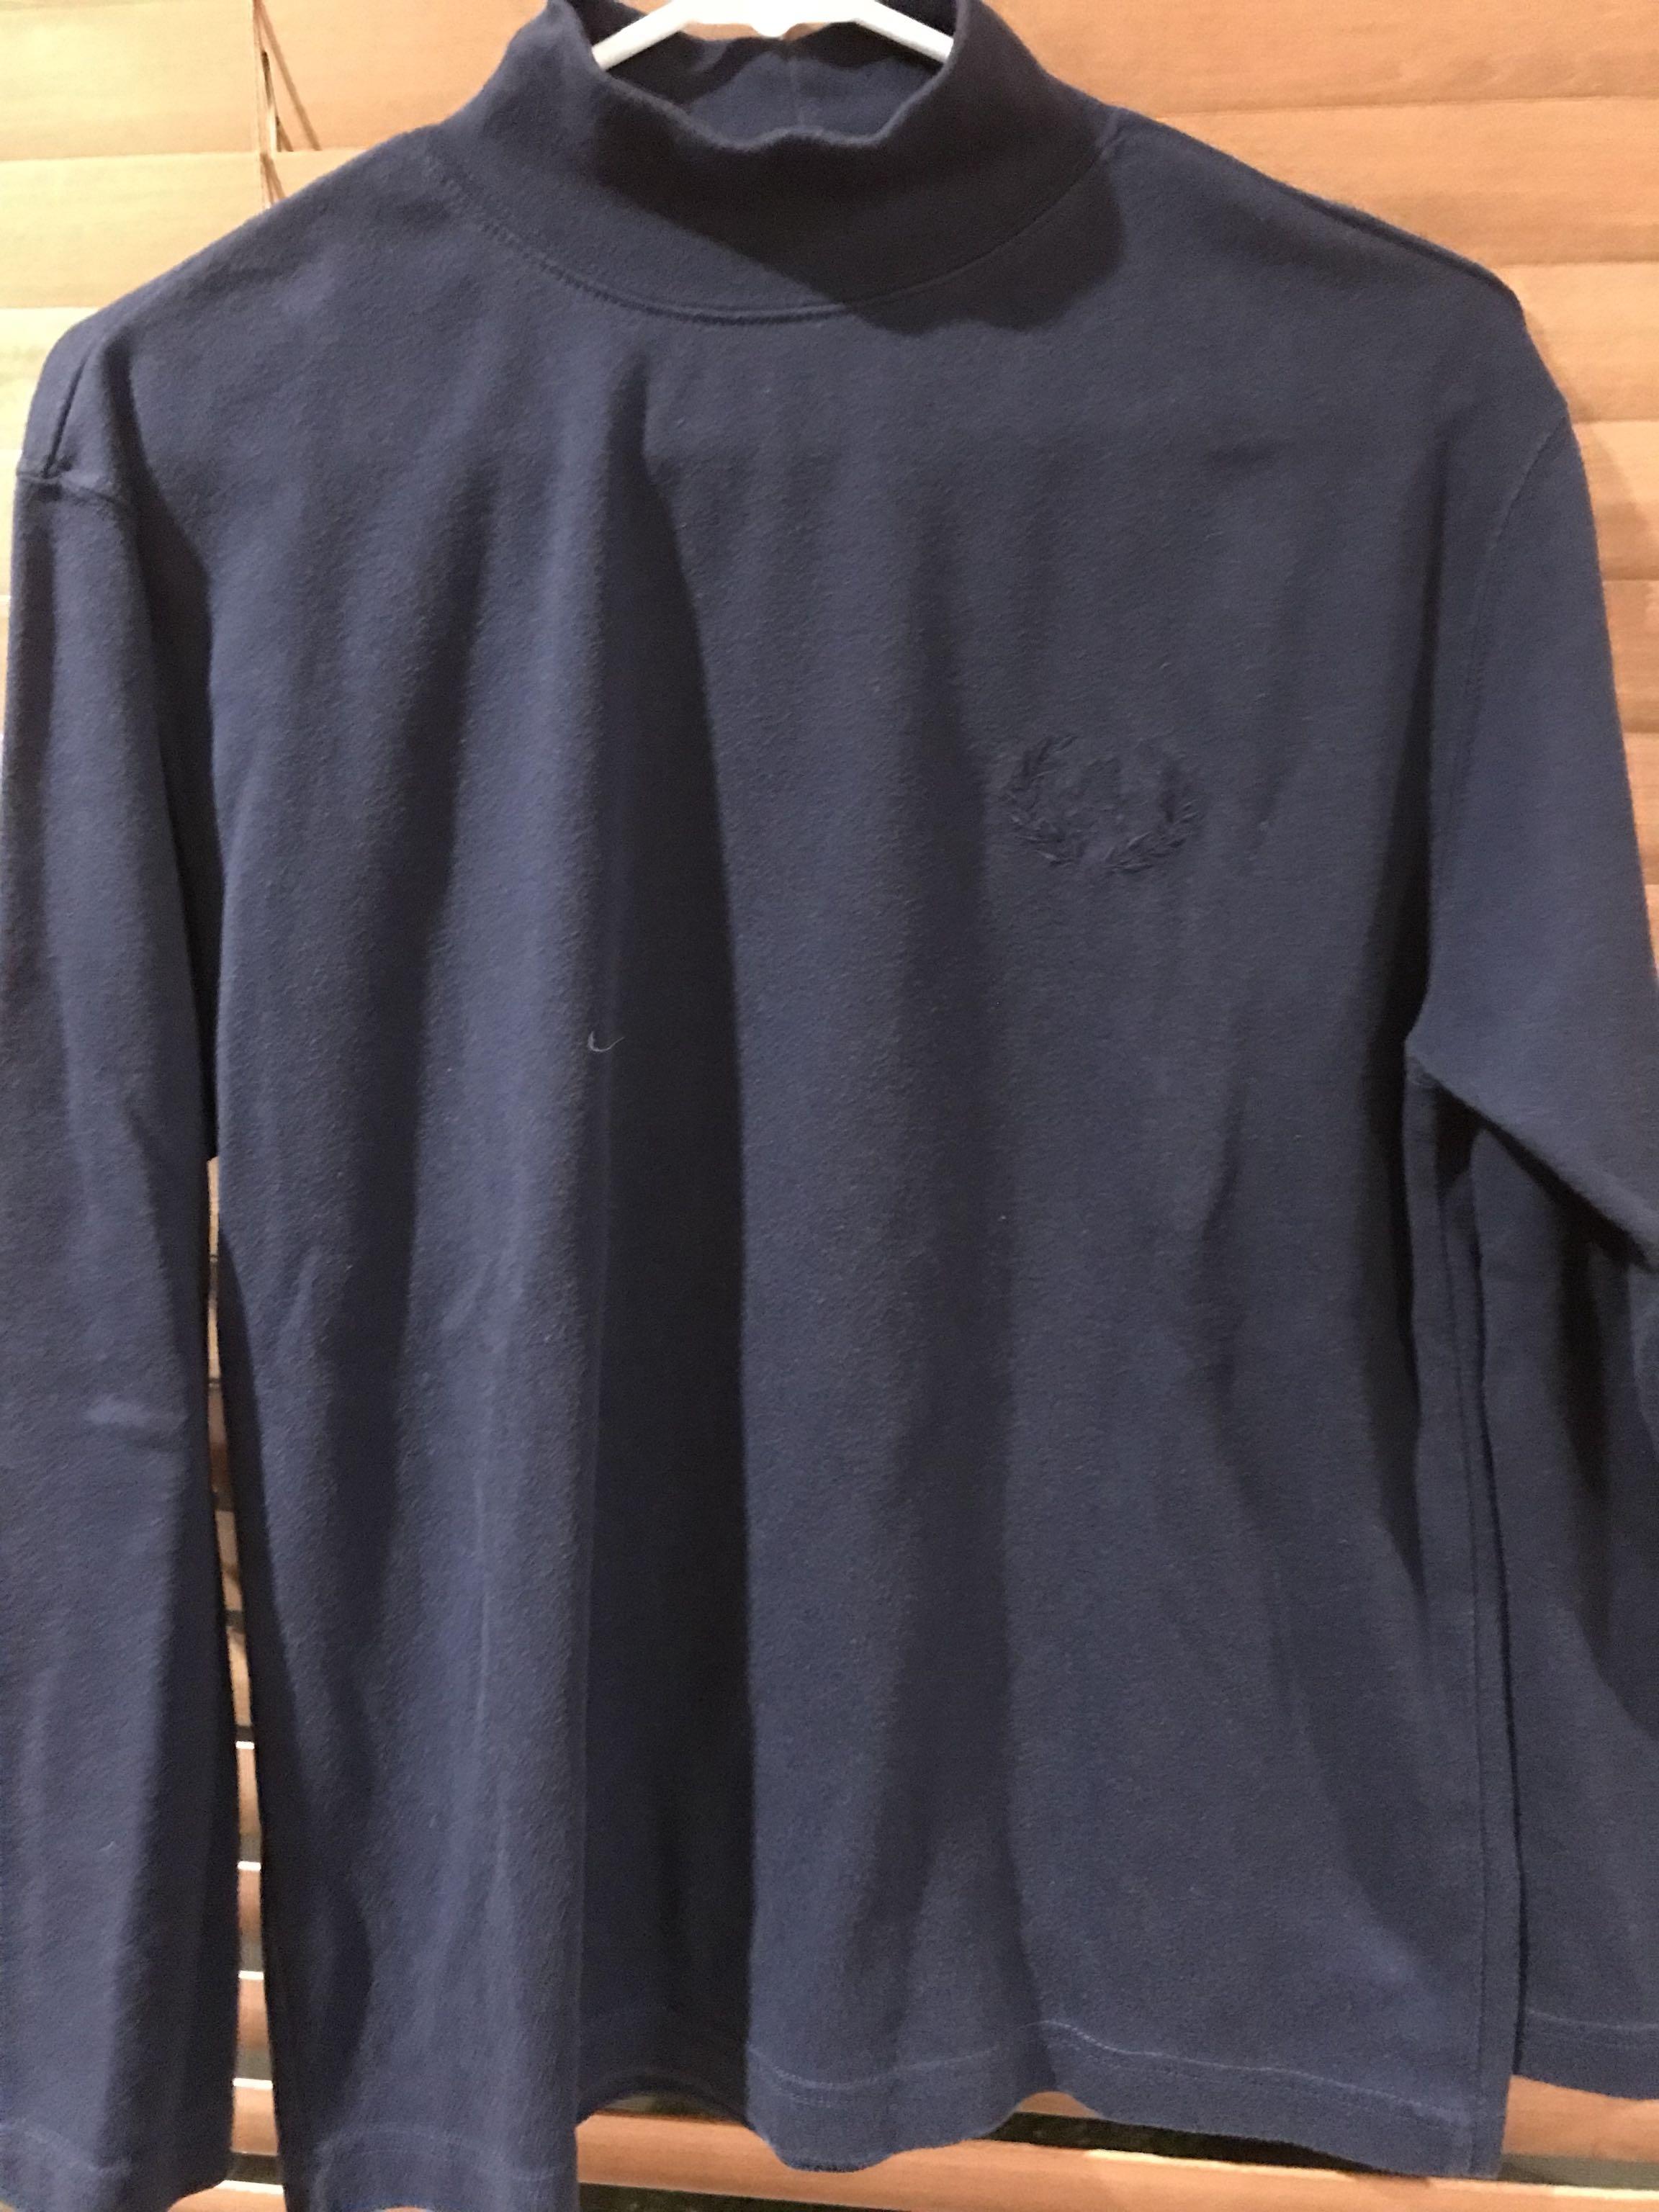 Womans medium shirt